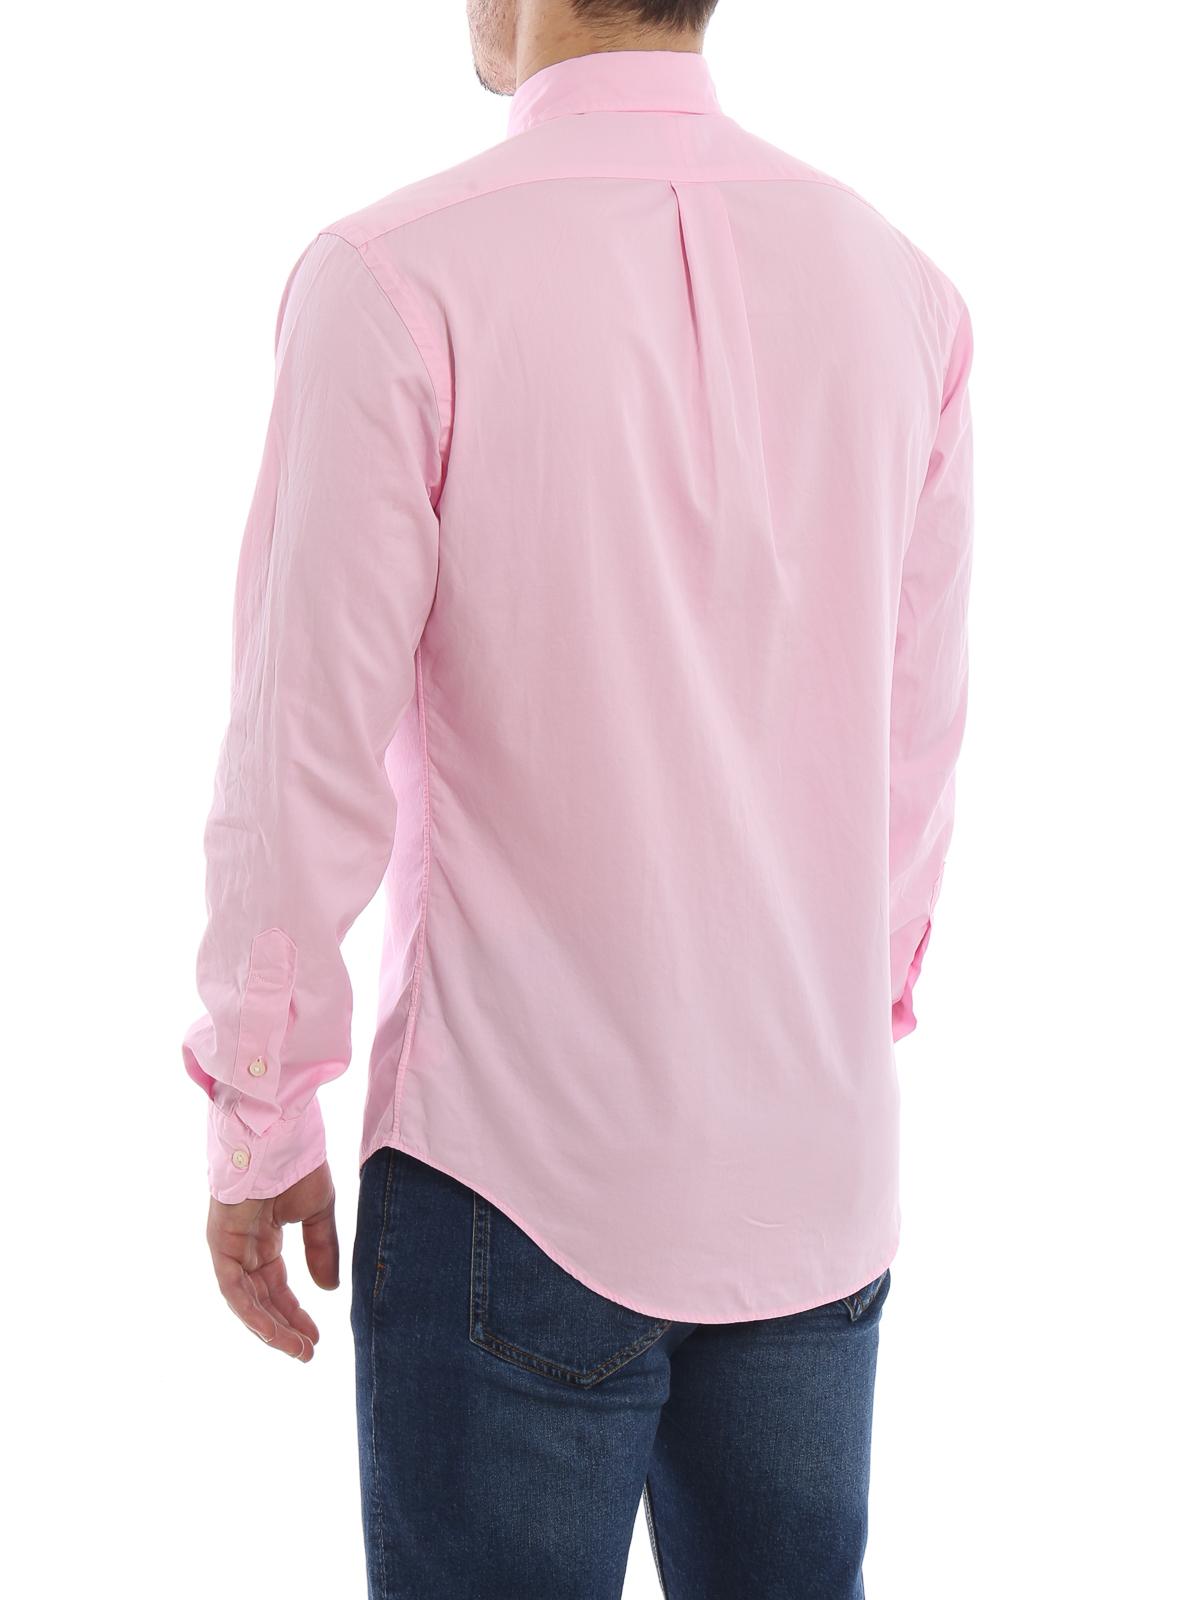 new style 0cfa0 665d3 Polo Ralph Lauren - Hemd - Rosa - Hemden - 710741788001